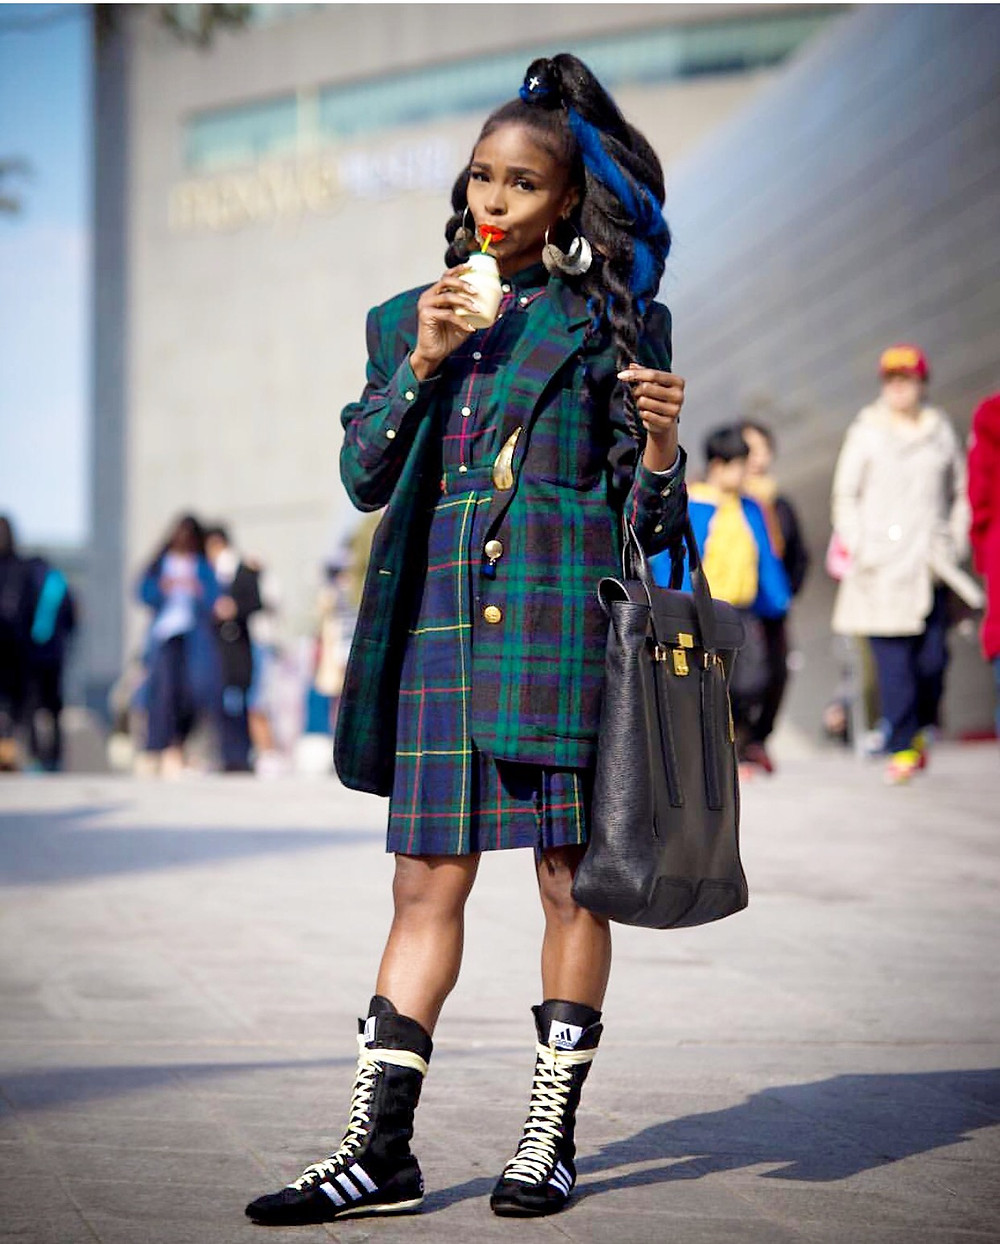 Kpop Style Star TELISU In Ralph Lauren Blackwatch Plaid At Seoul Fashion Week